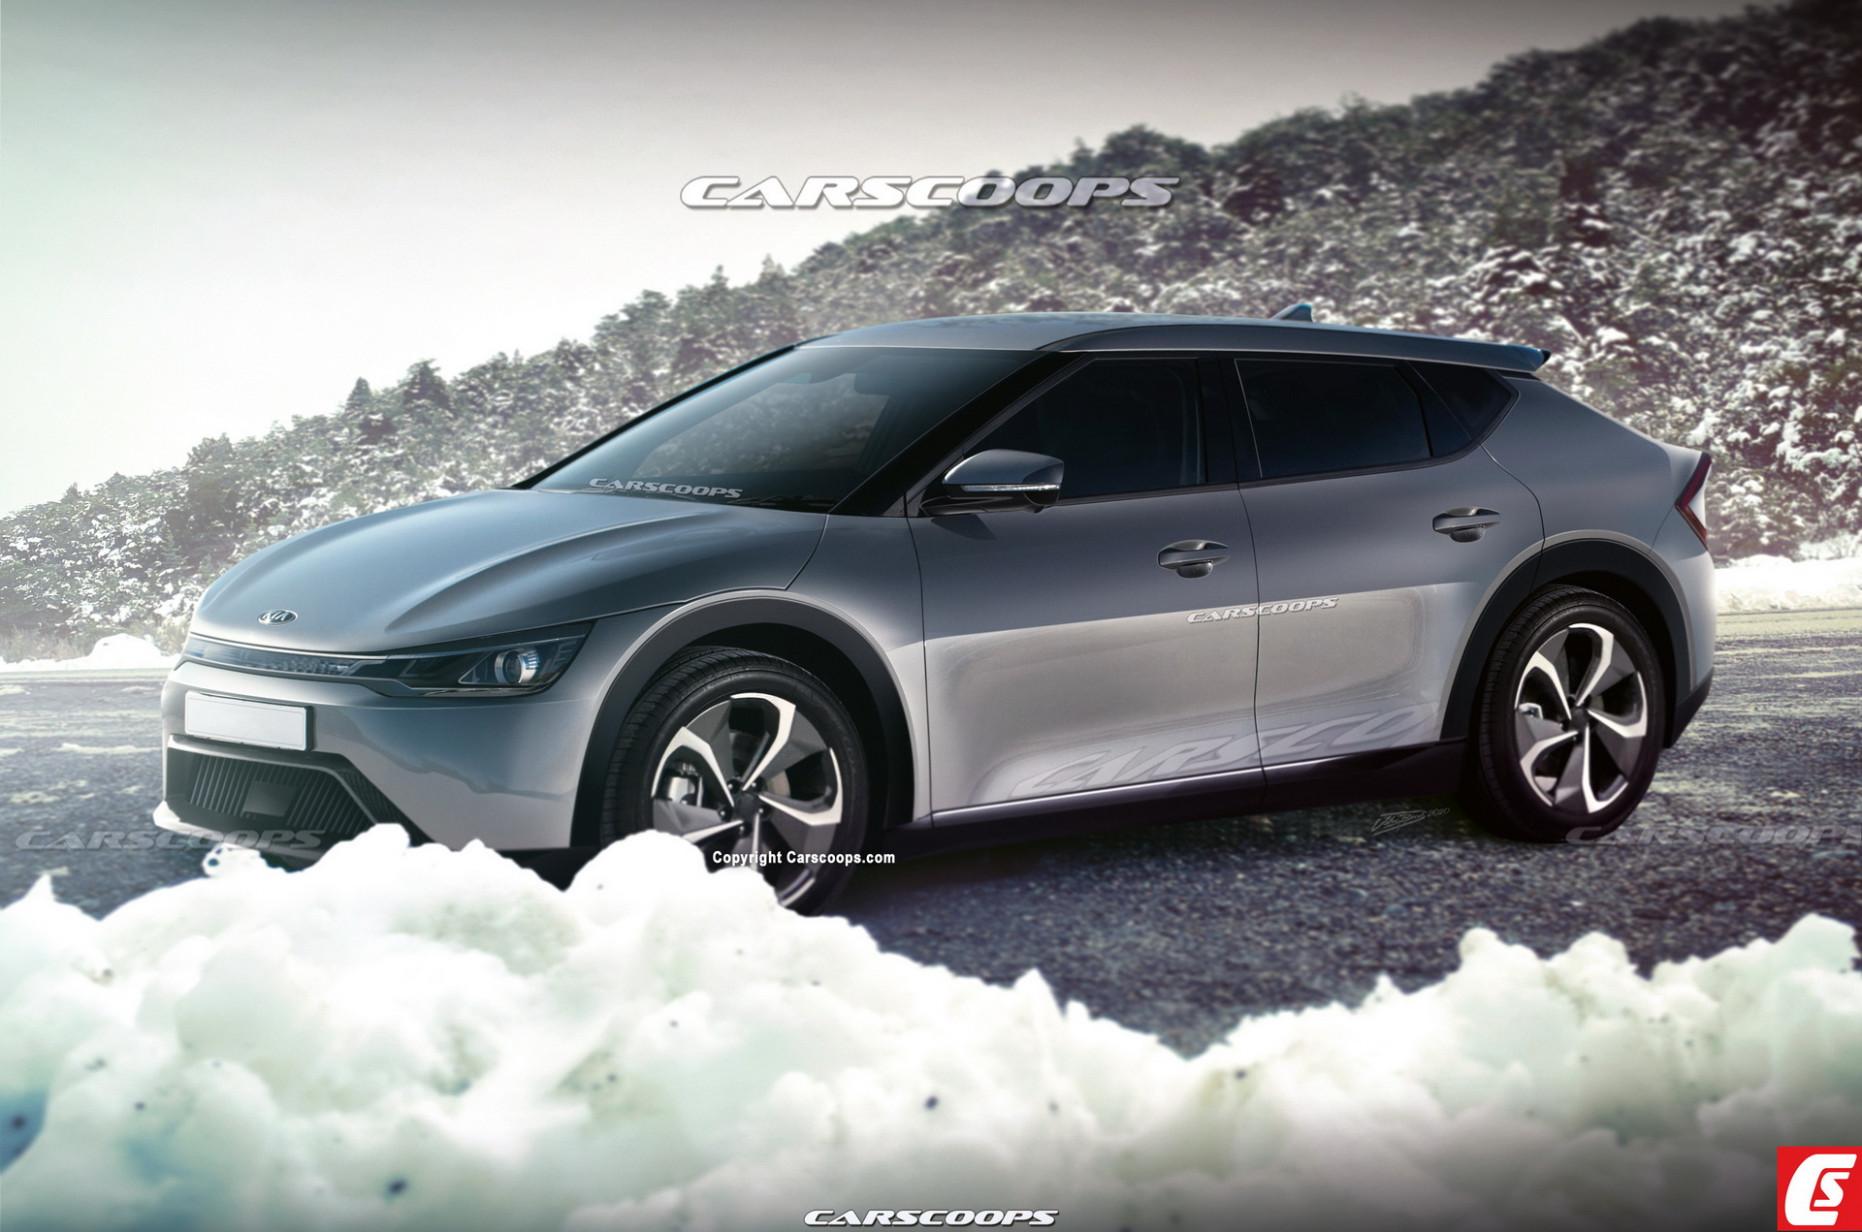 Model Kia Cars 2022